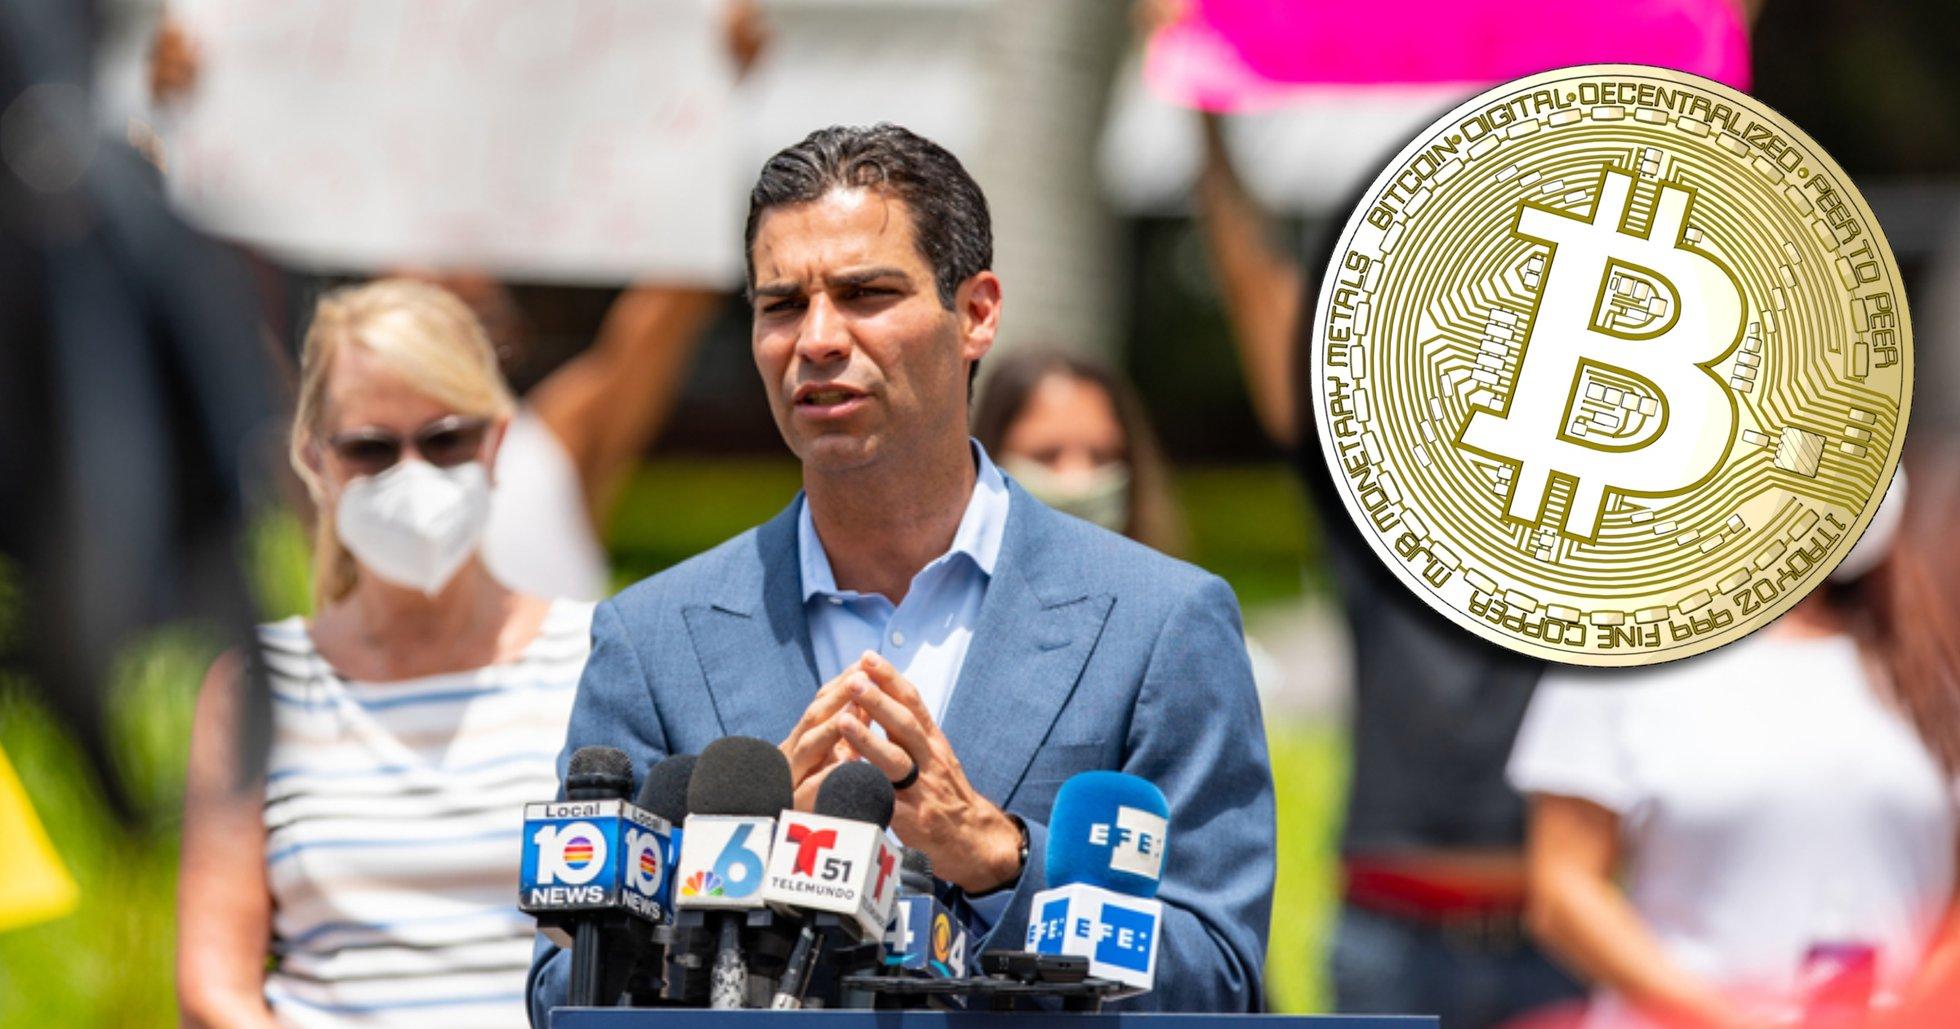 Miami ska utreda kommunala löner utbetalda i bitcoin